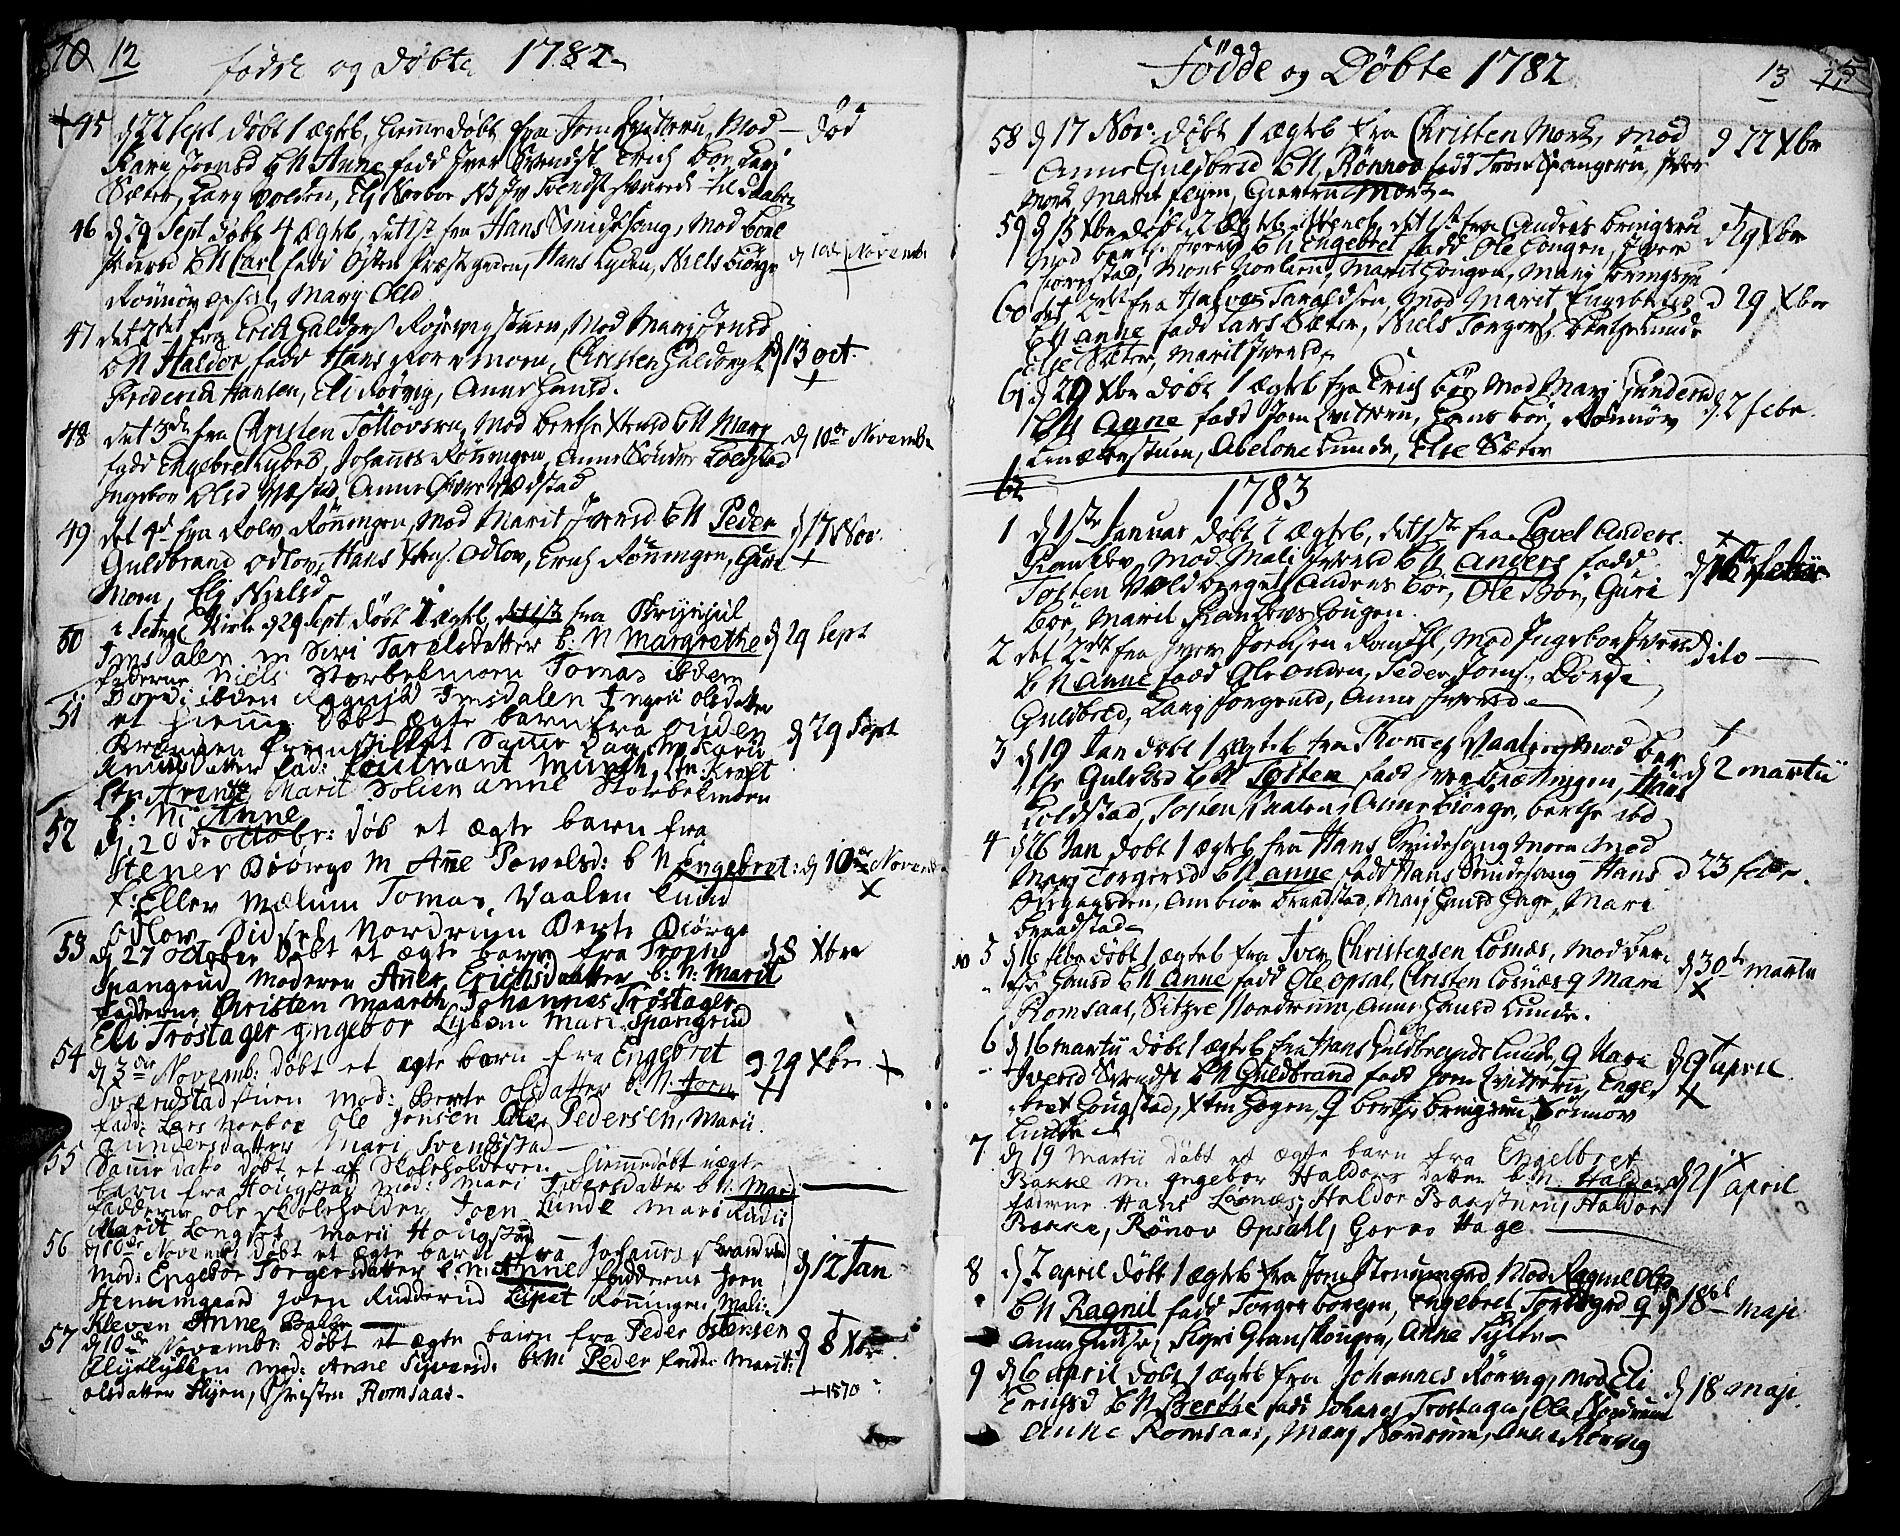 SAH, Ringebu prestekontor, Ministerialbok nr. 3, 1781-1820, s. 12-13